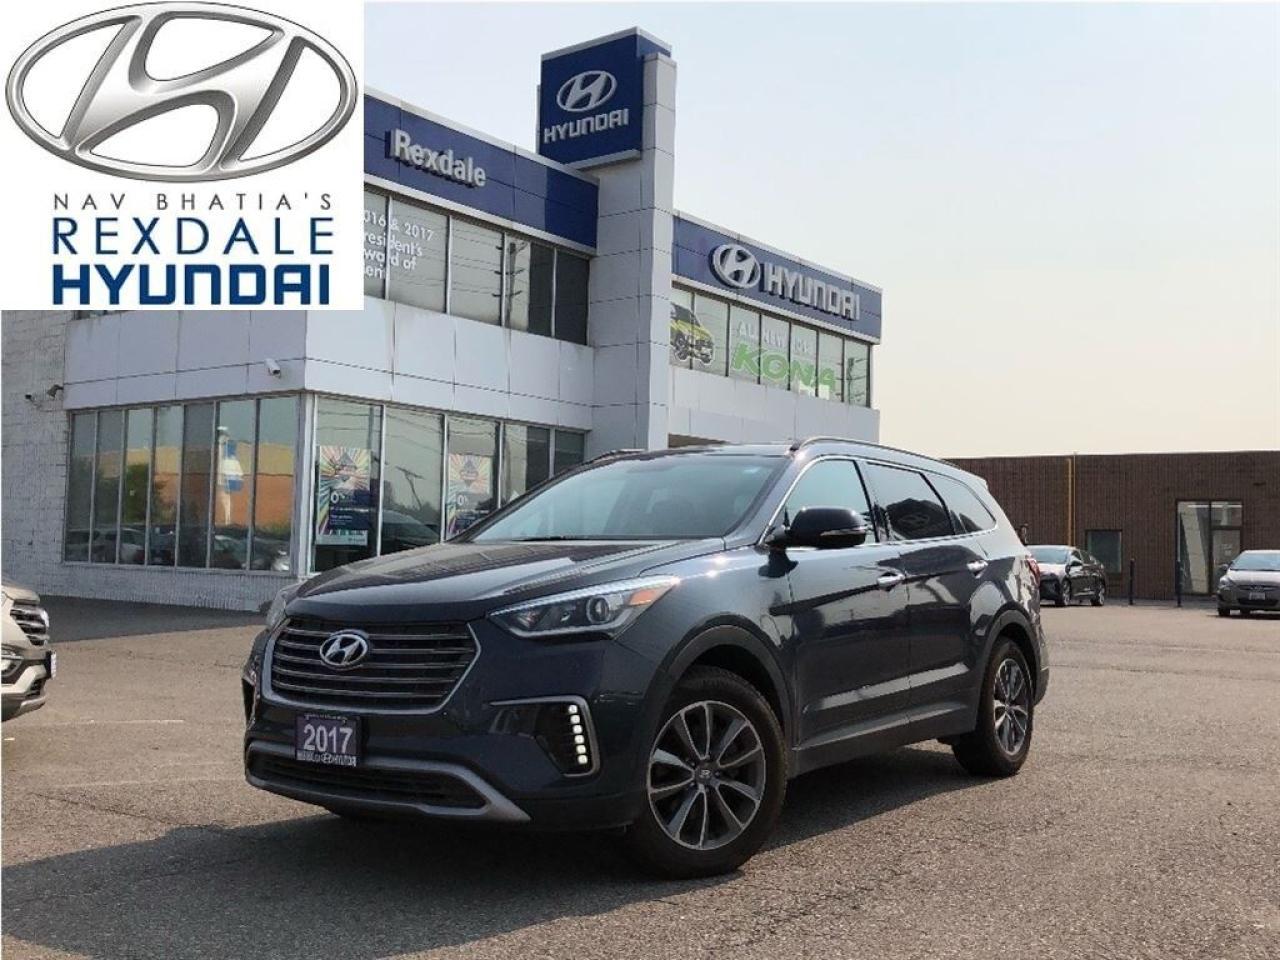 2017 Hyundai Santa Fe XL Premium, warranty up to 100000 km